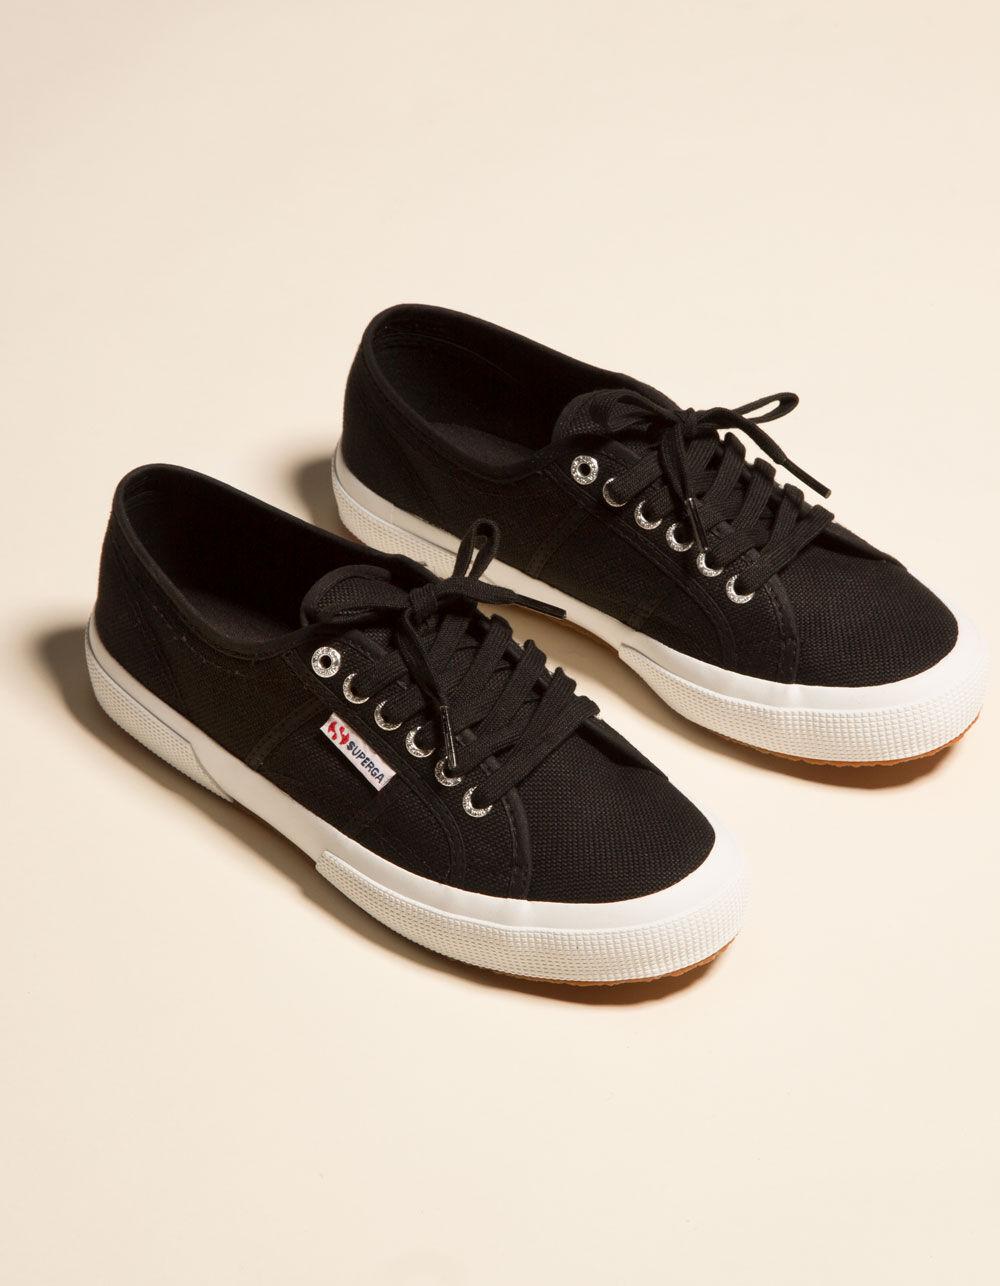 SUPERGA 2750 Cotu Classic Black & White Shoes